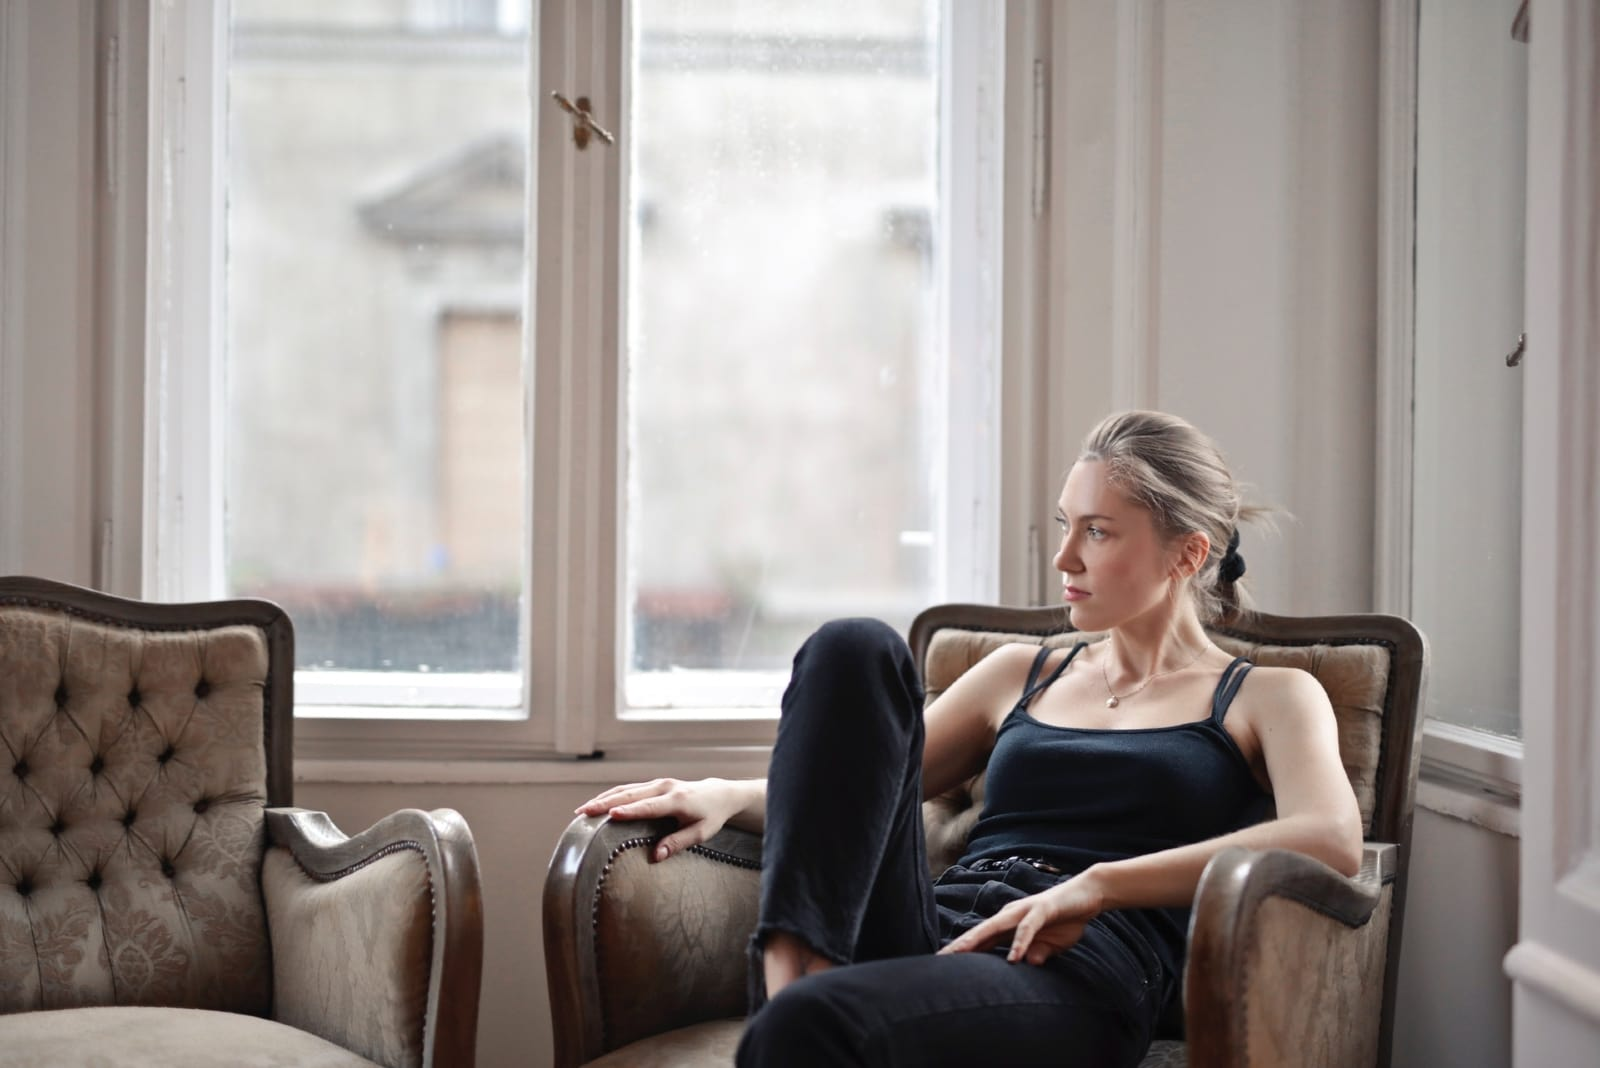 woman in black top sitting on armchair near window